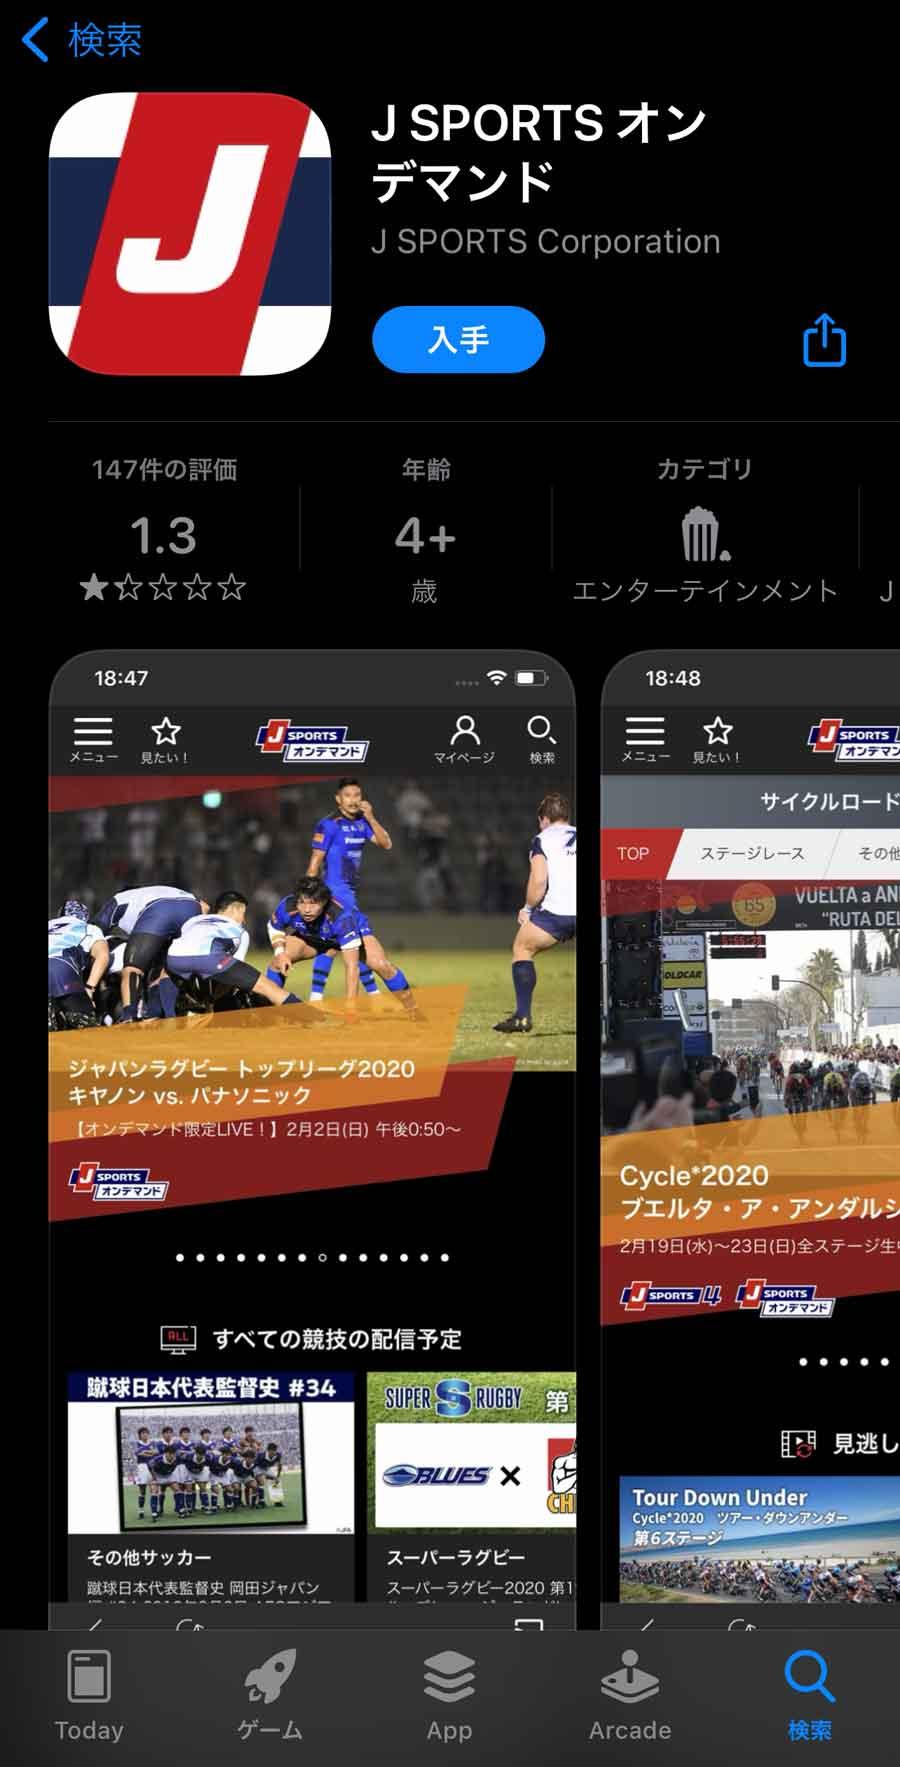 J SPORTSオンデマンドアプリ